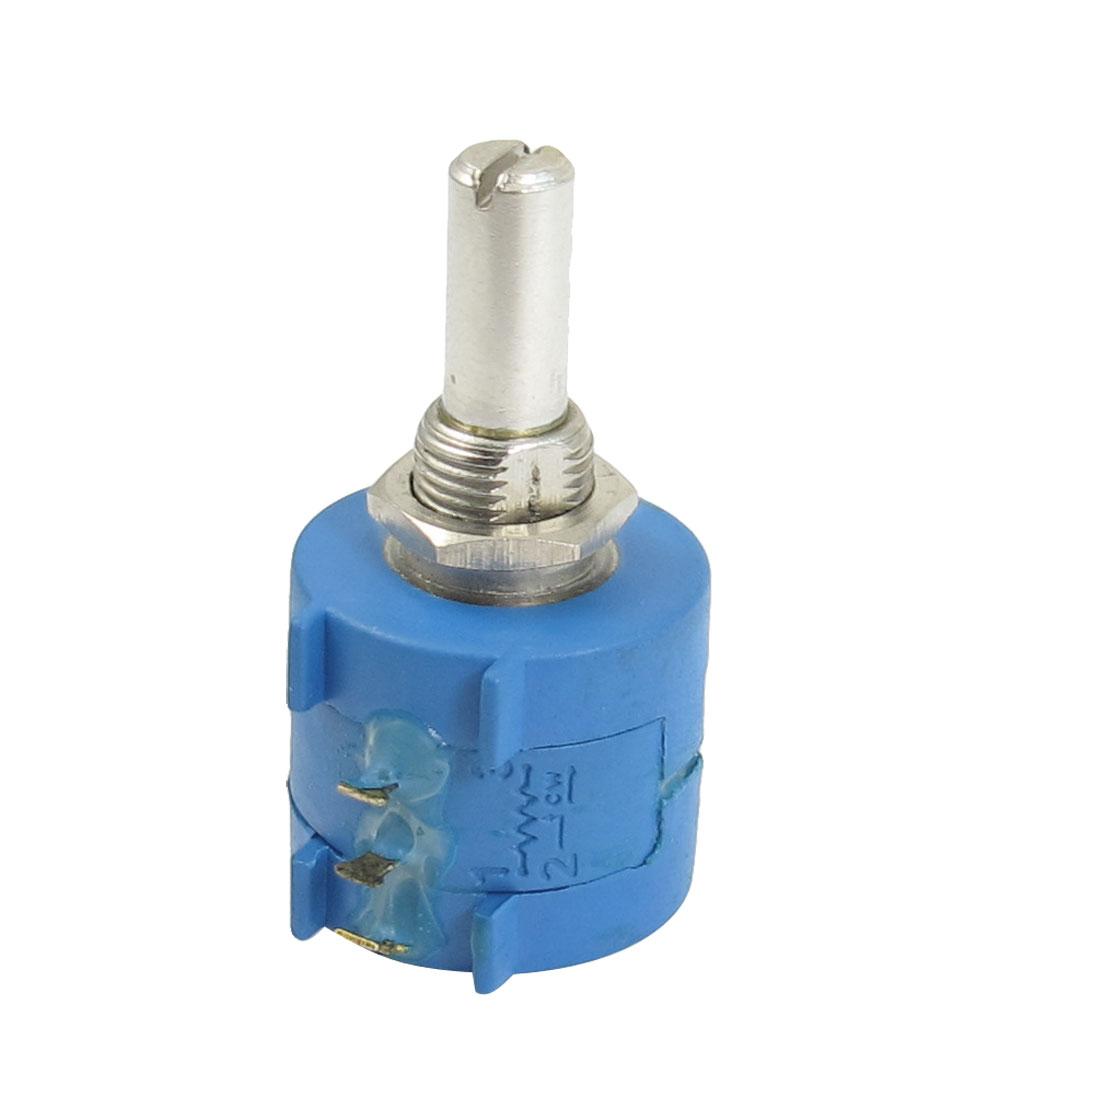 3590S-2-502L 5K Ohm 10-Turn Rotary Wire Wound Precision Potentiometer Pot